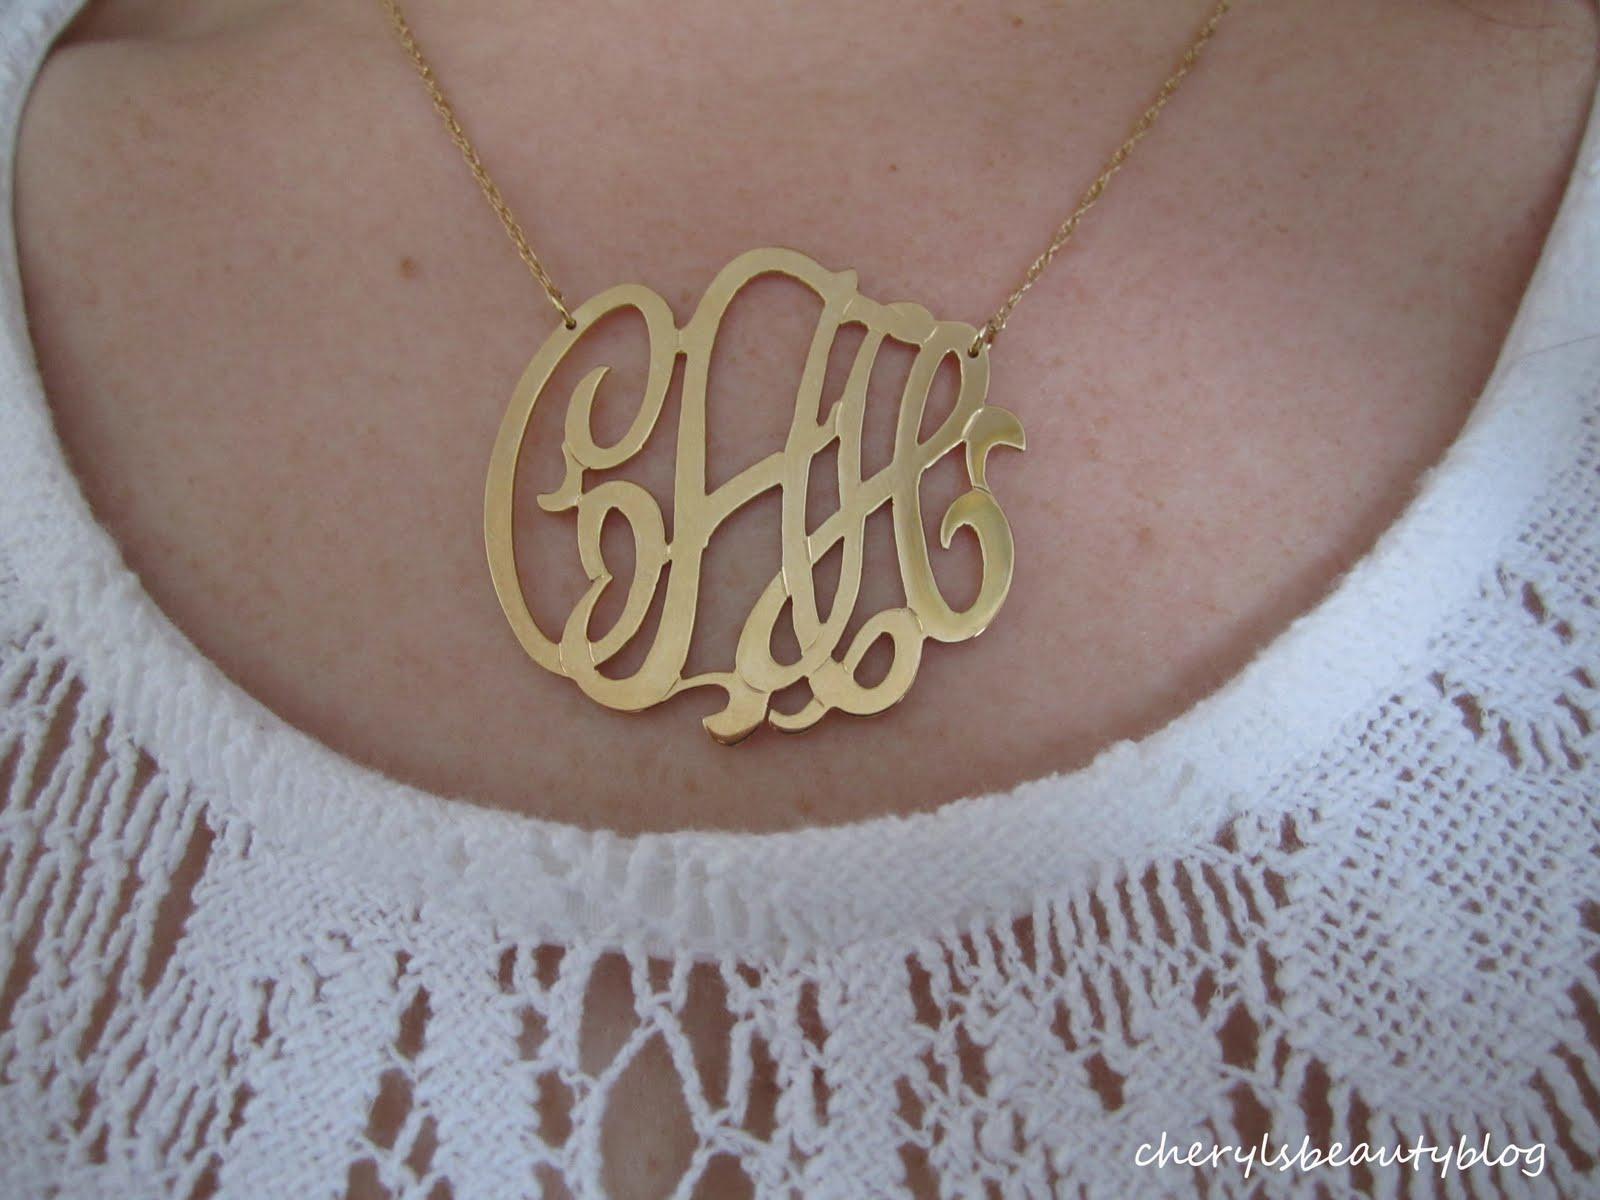 Jennifer zeuner jewelry large swirly 3 initial pendant necklace jennifer zeuner jewelry large swirly 3 initial pendant necklace mozeypictures Image collections